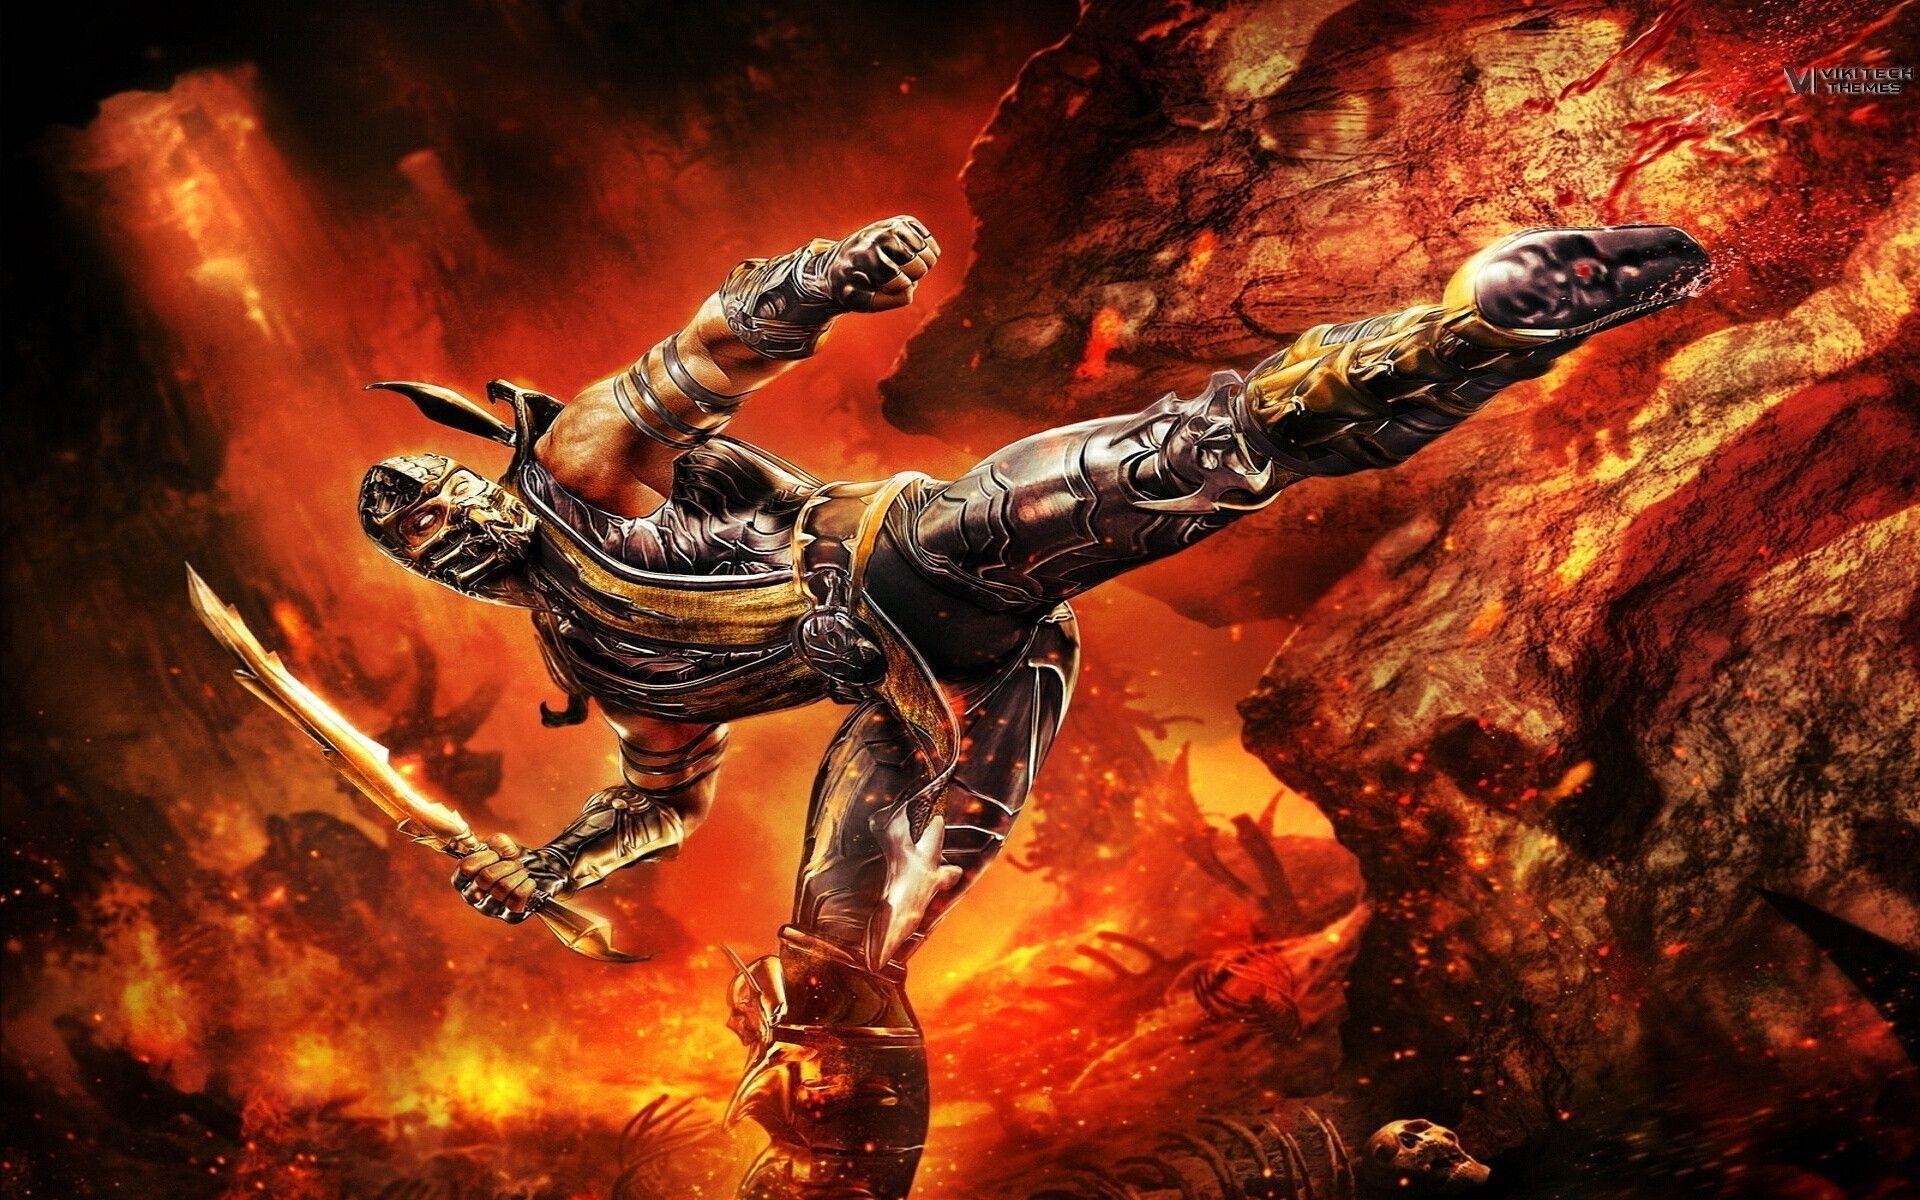 Mortal Kombat Wallpapers Scorpion - Wallpaper Cave